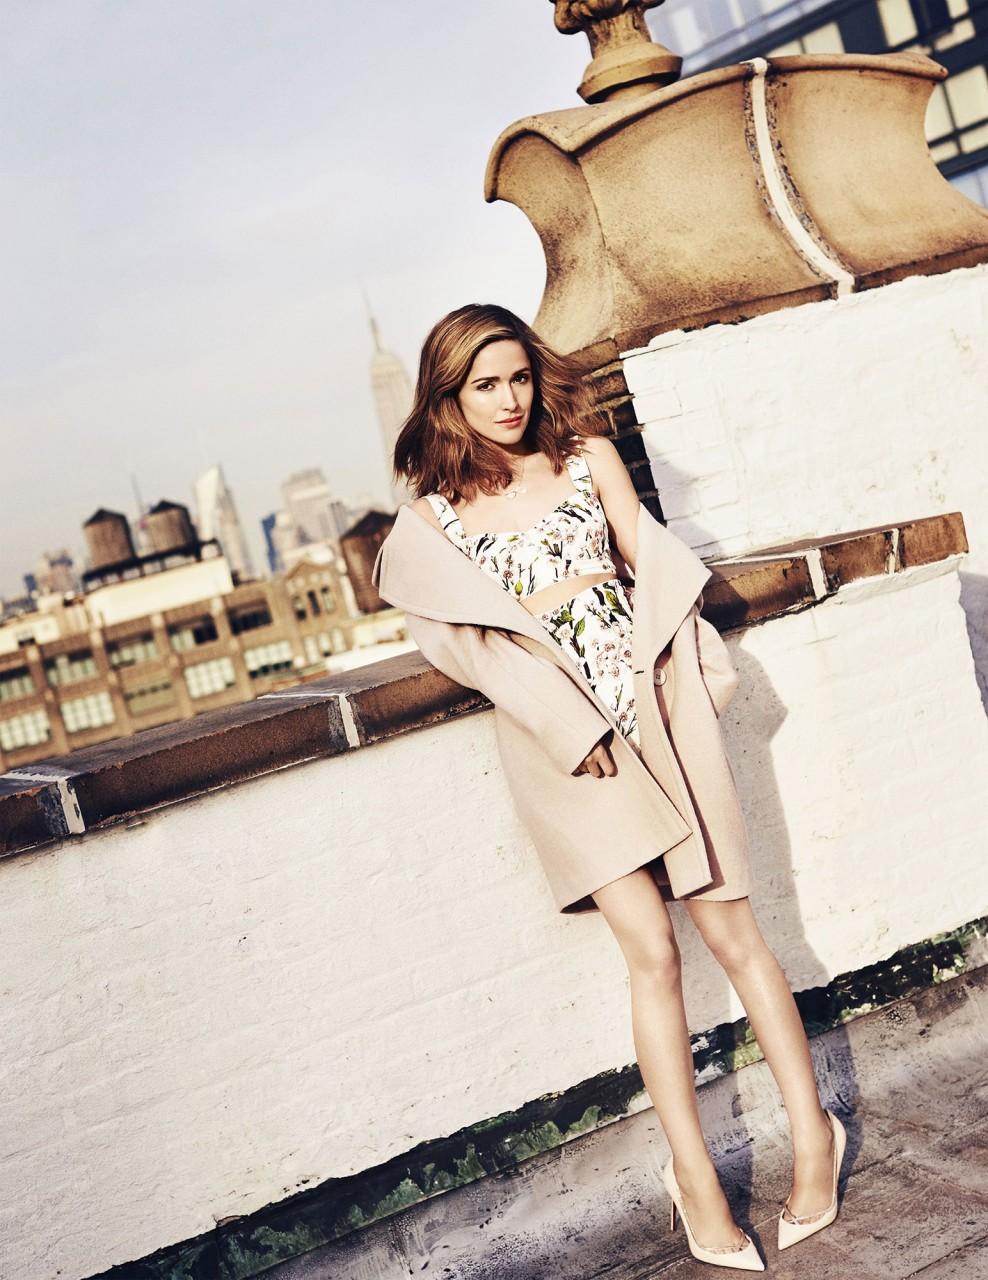 Роуз Бирн в фотосессии Бена Морриса  для журнала ELLE Australia май 2014